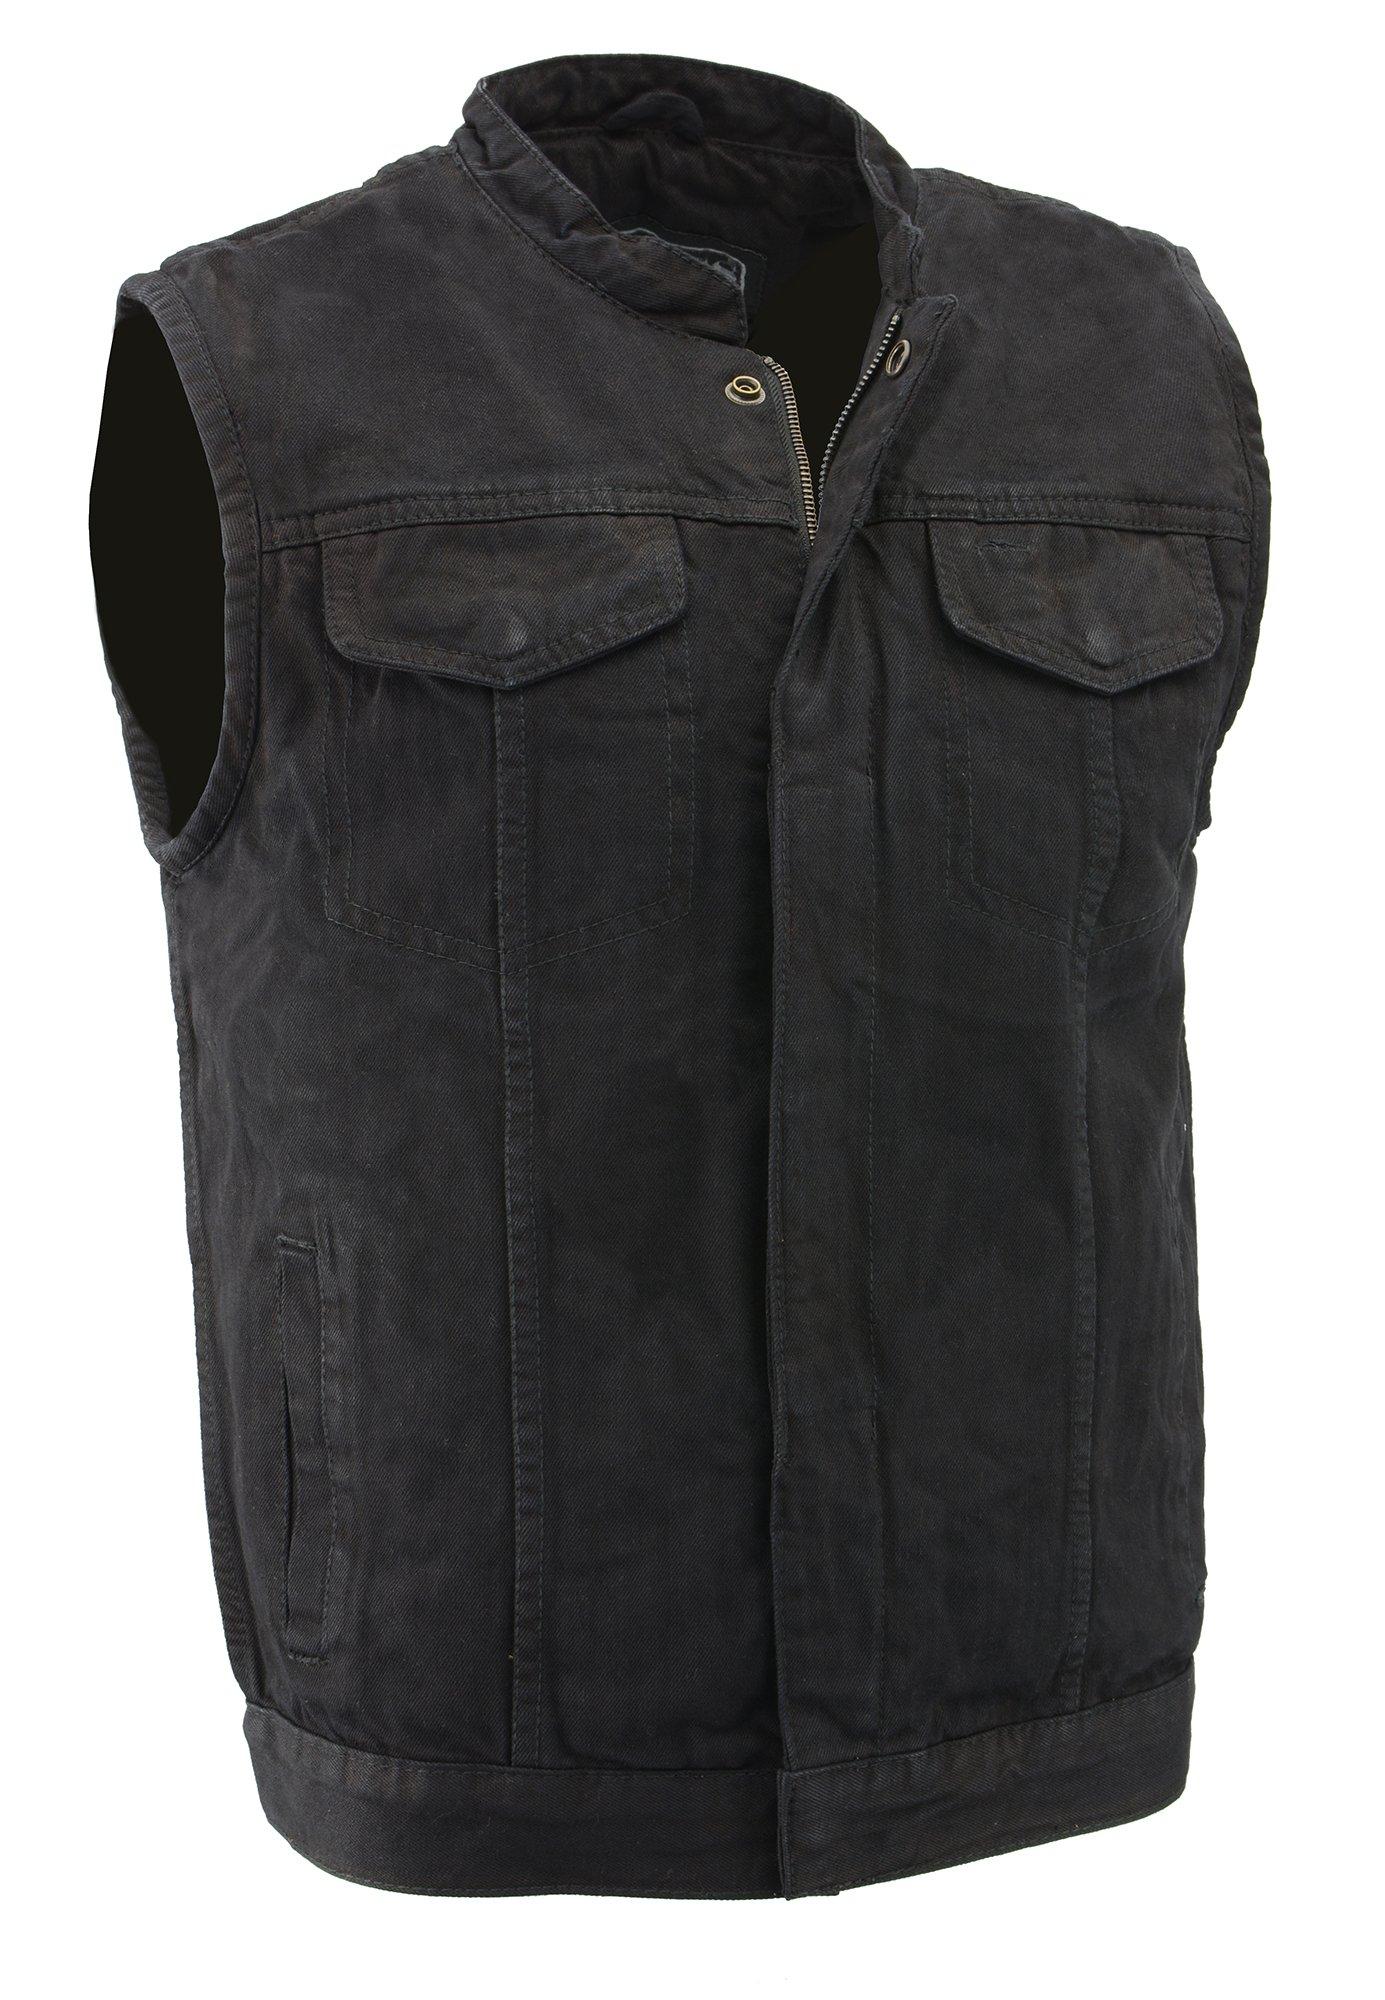 M-Boss Motorcycle Apparel-BOS13000-BLACK-Men's Denim Club Style Vest w/Hidden Zipper-BLACK-XL